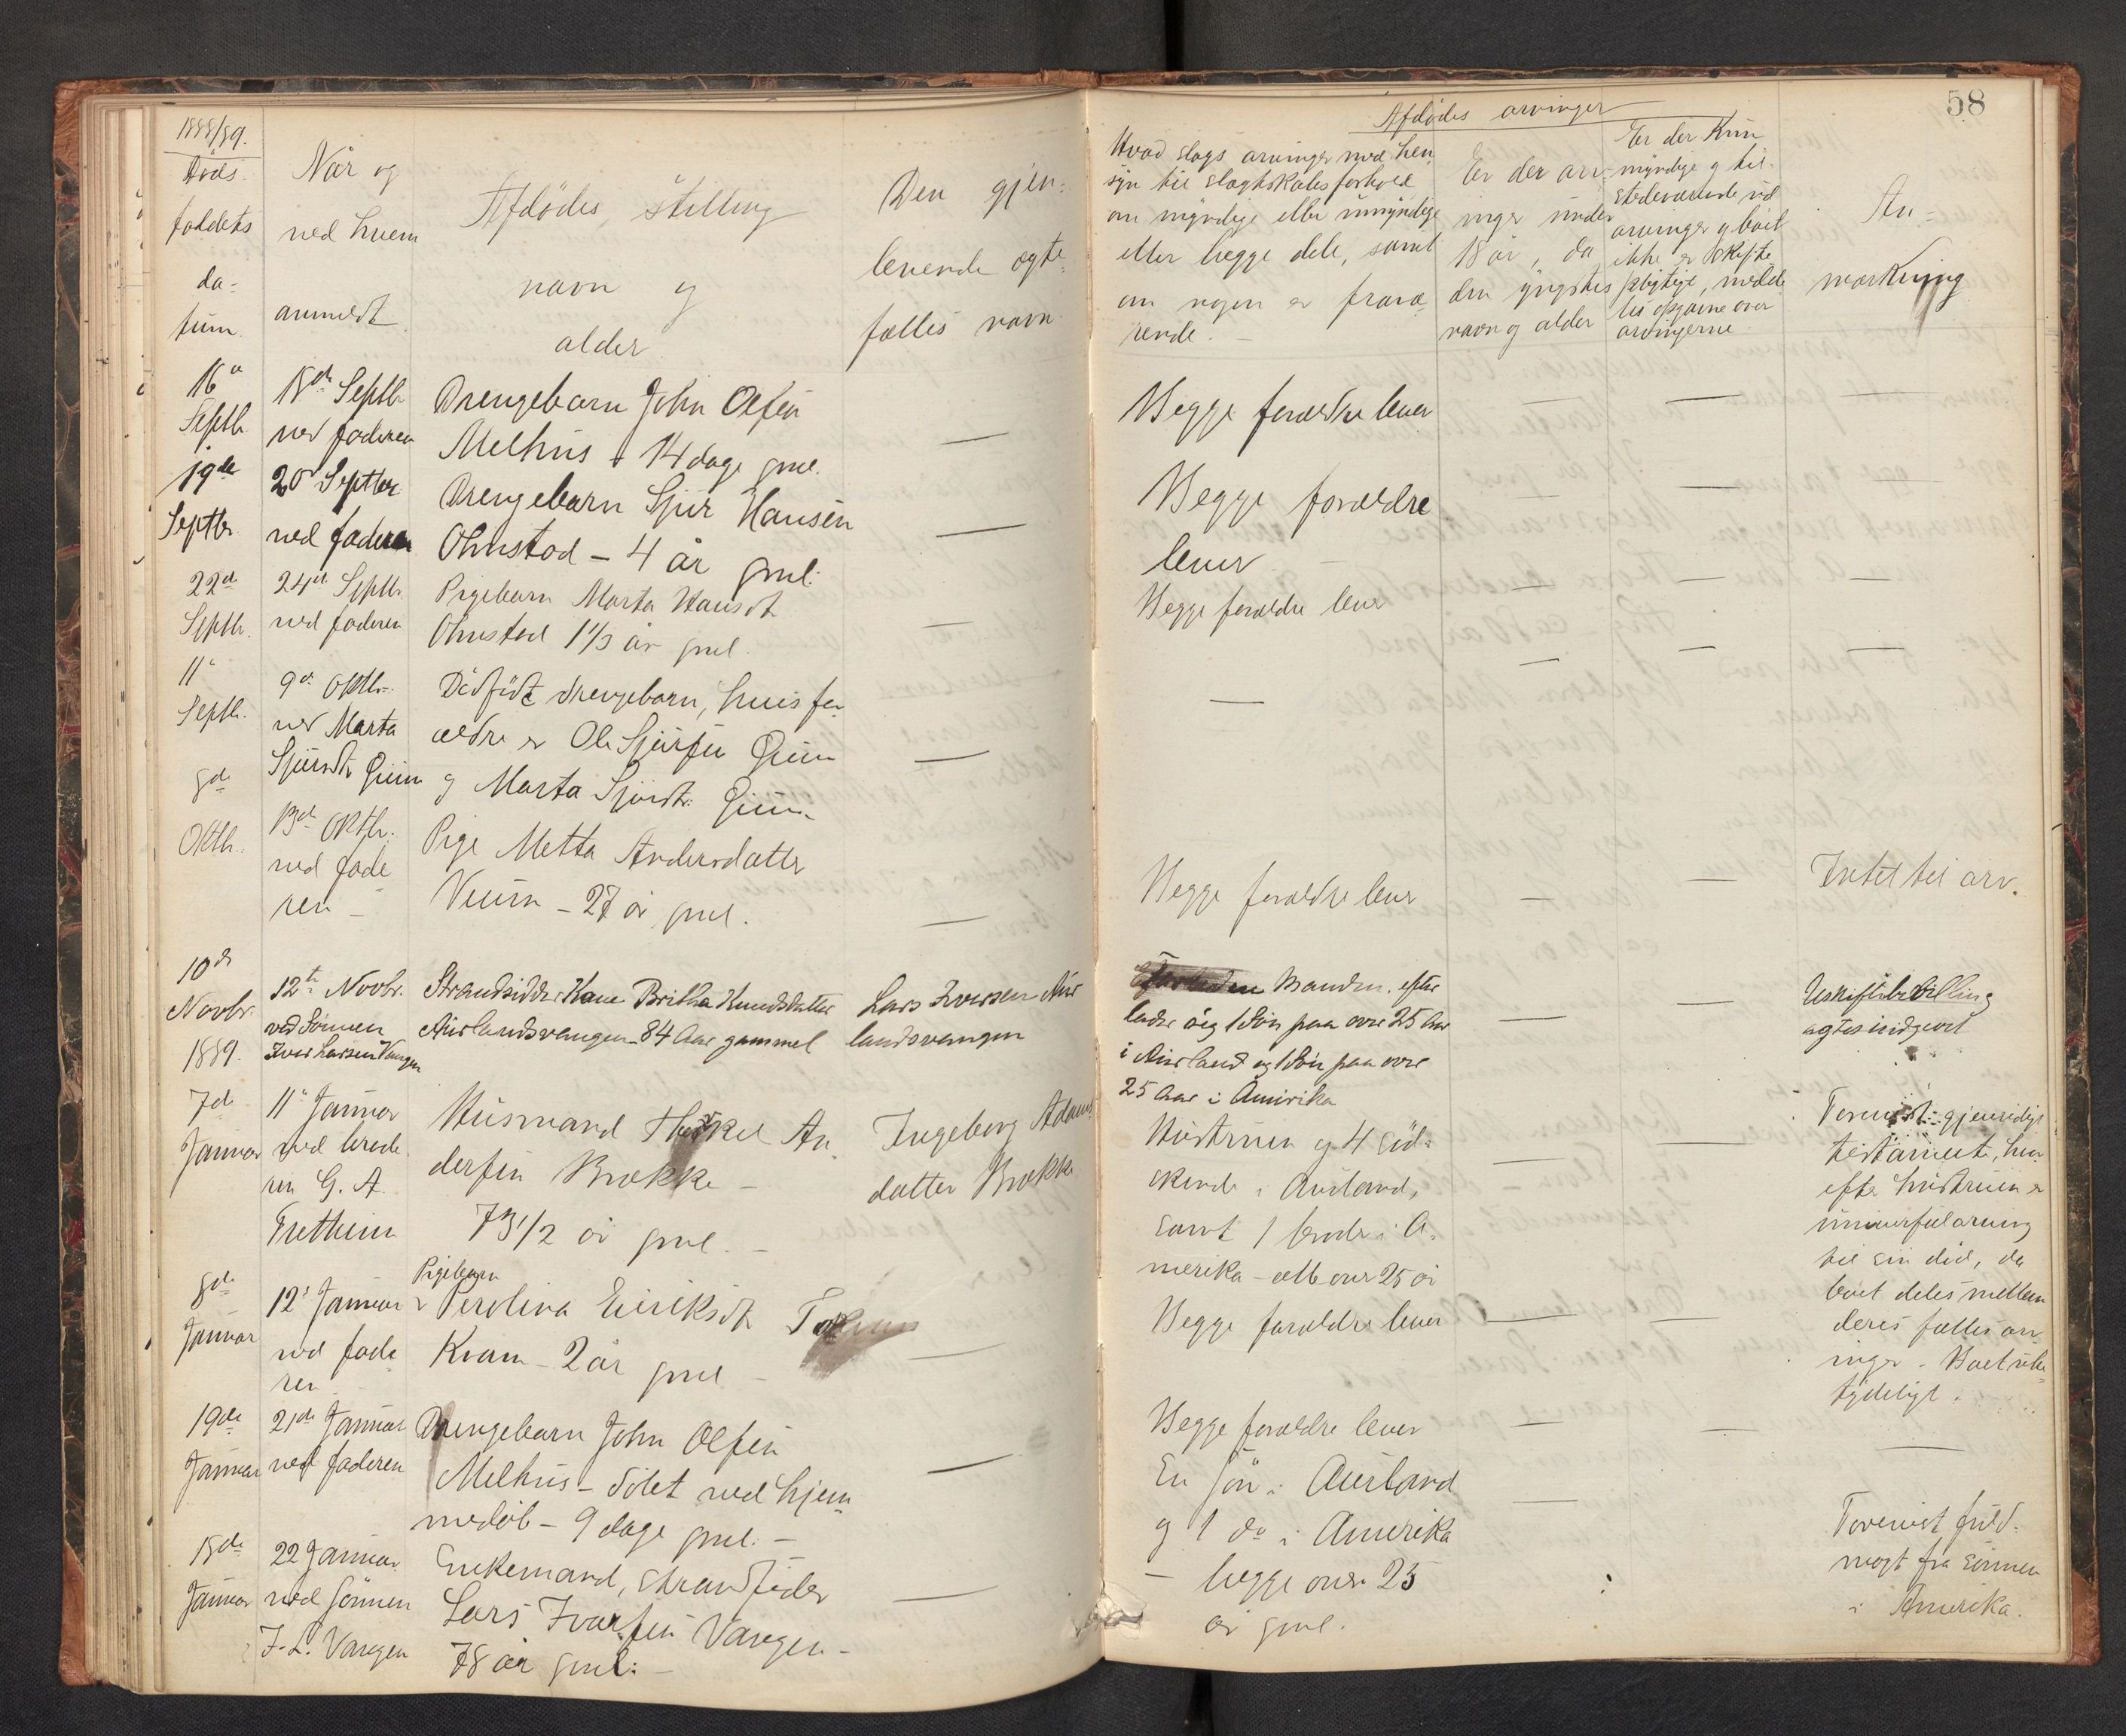 SAB, Lensmannen i Aurland, 0006/L0002: Dødsfallprotokoll, 1877-1892, s. 57b-58a